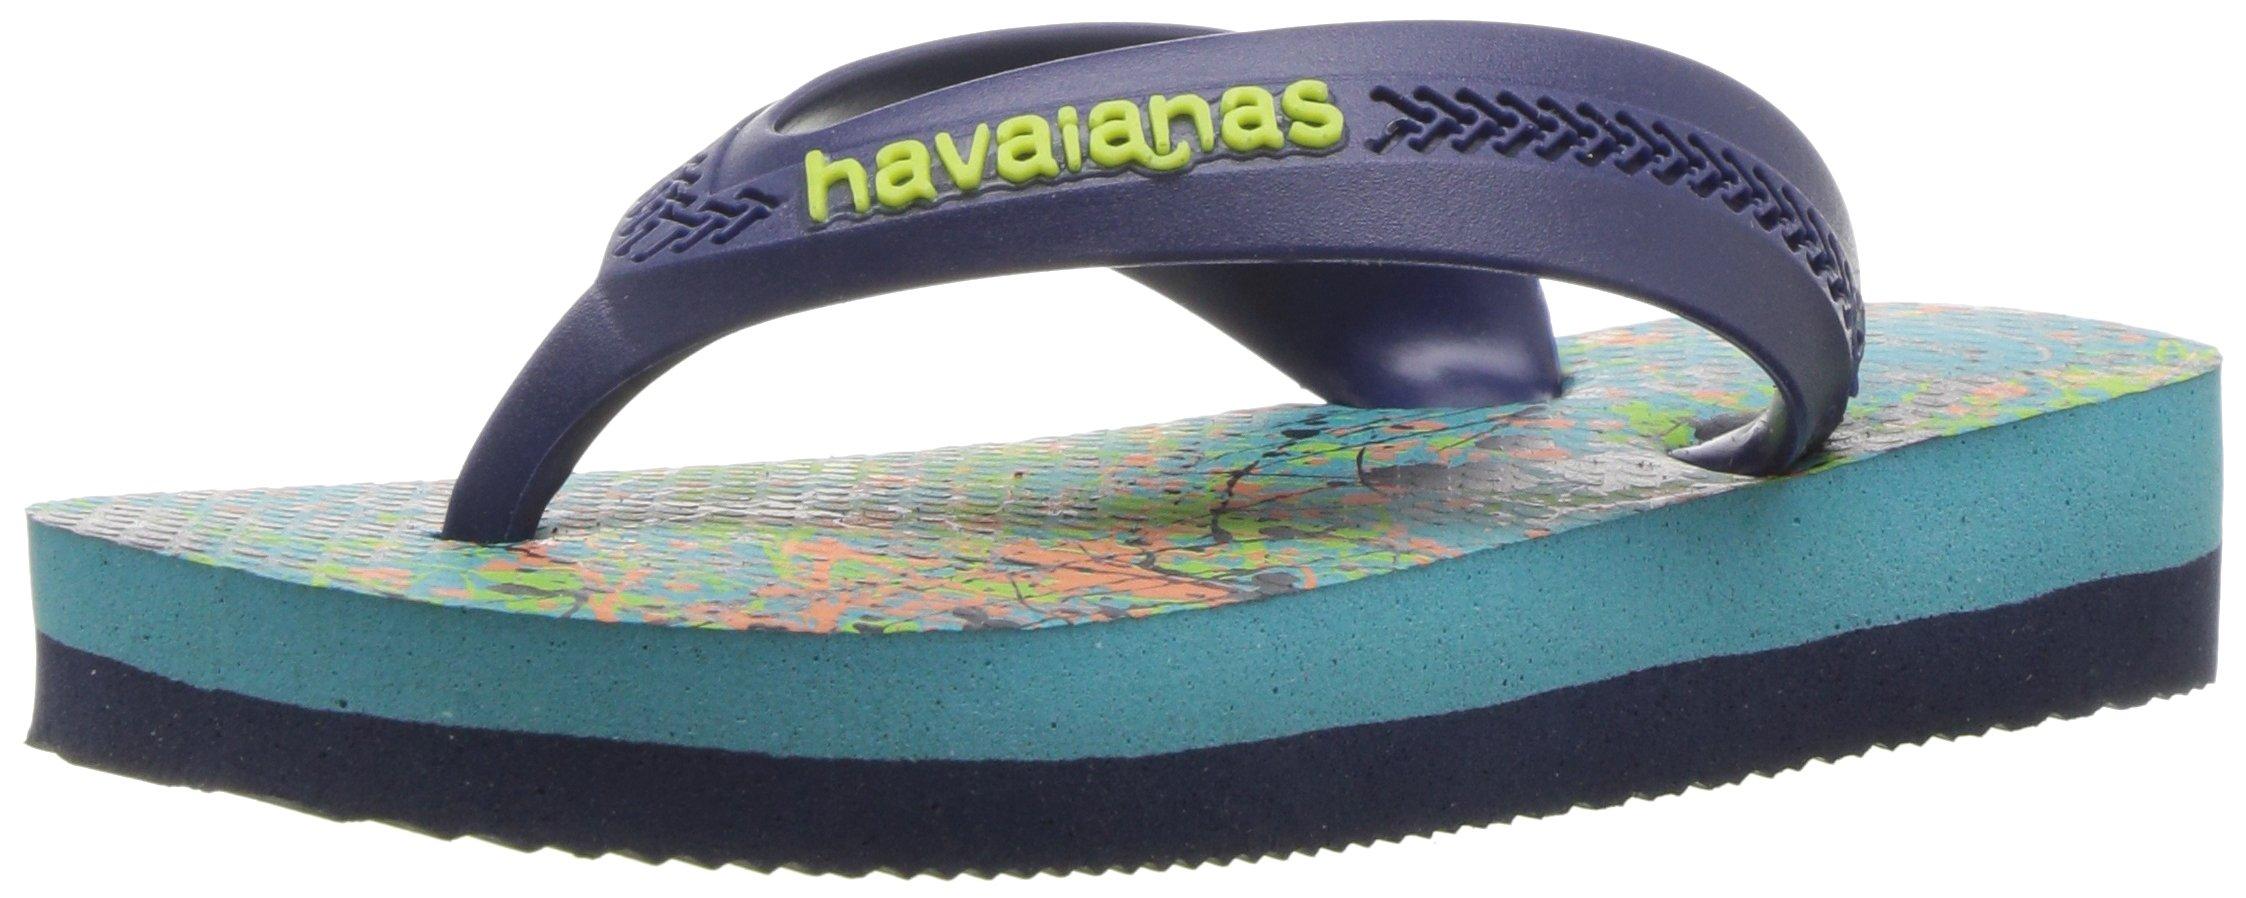 Havaianas Flip Flop Sandals, Kids Max Trend,Blue/Navy Blue,33/34 BR (3-4 M US Little Kid)